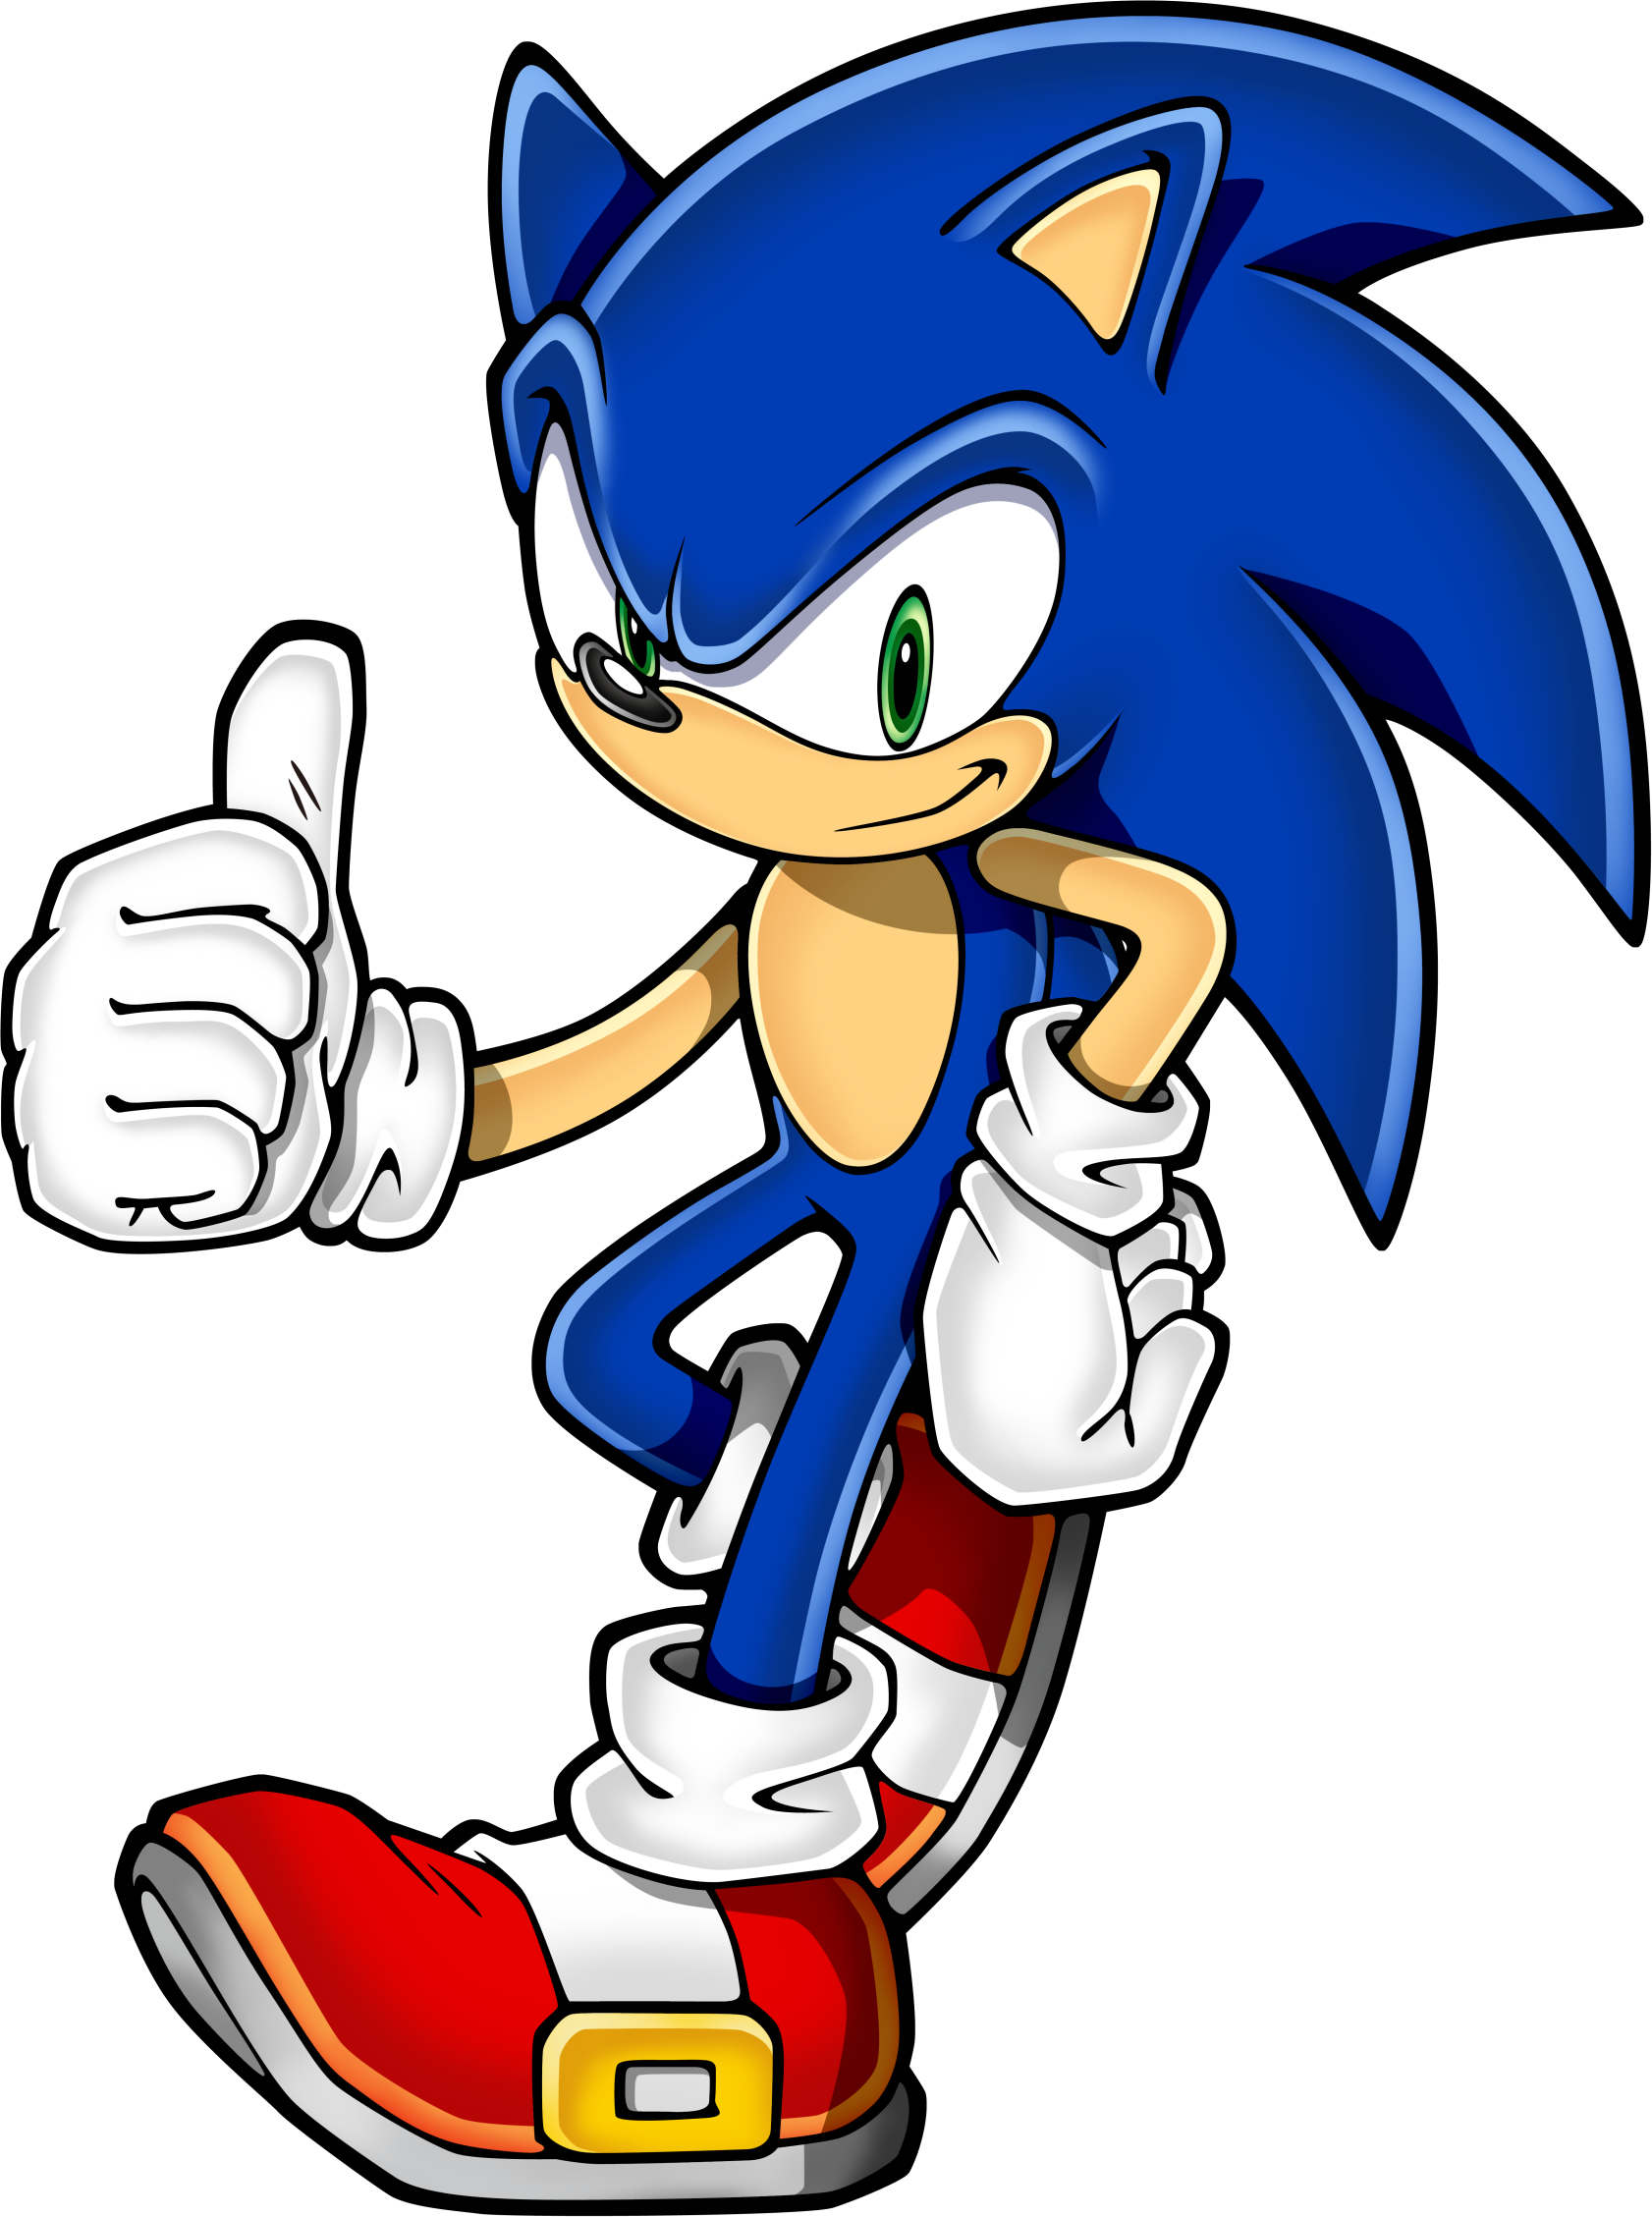 Hedgehog clipart simple. Sonic art assets dvd